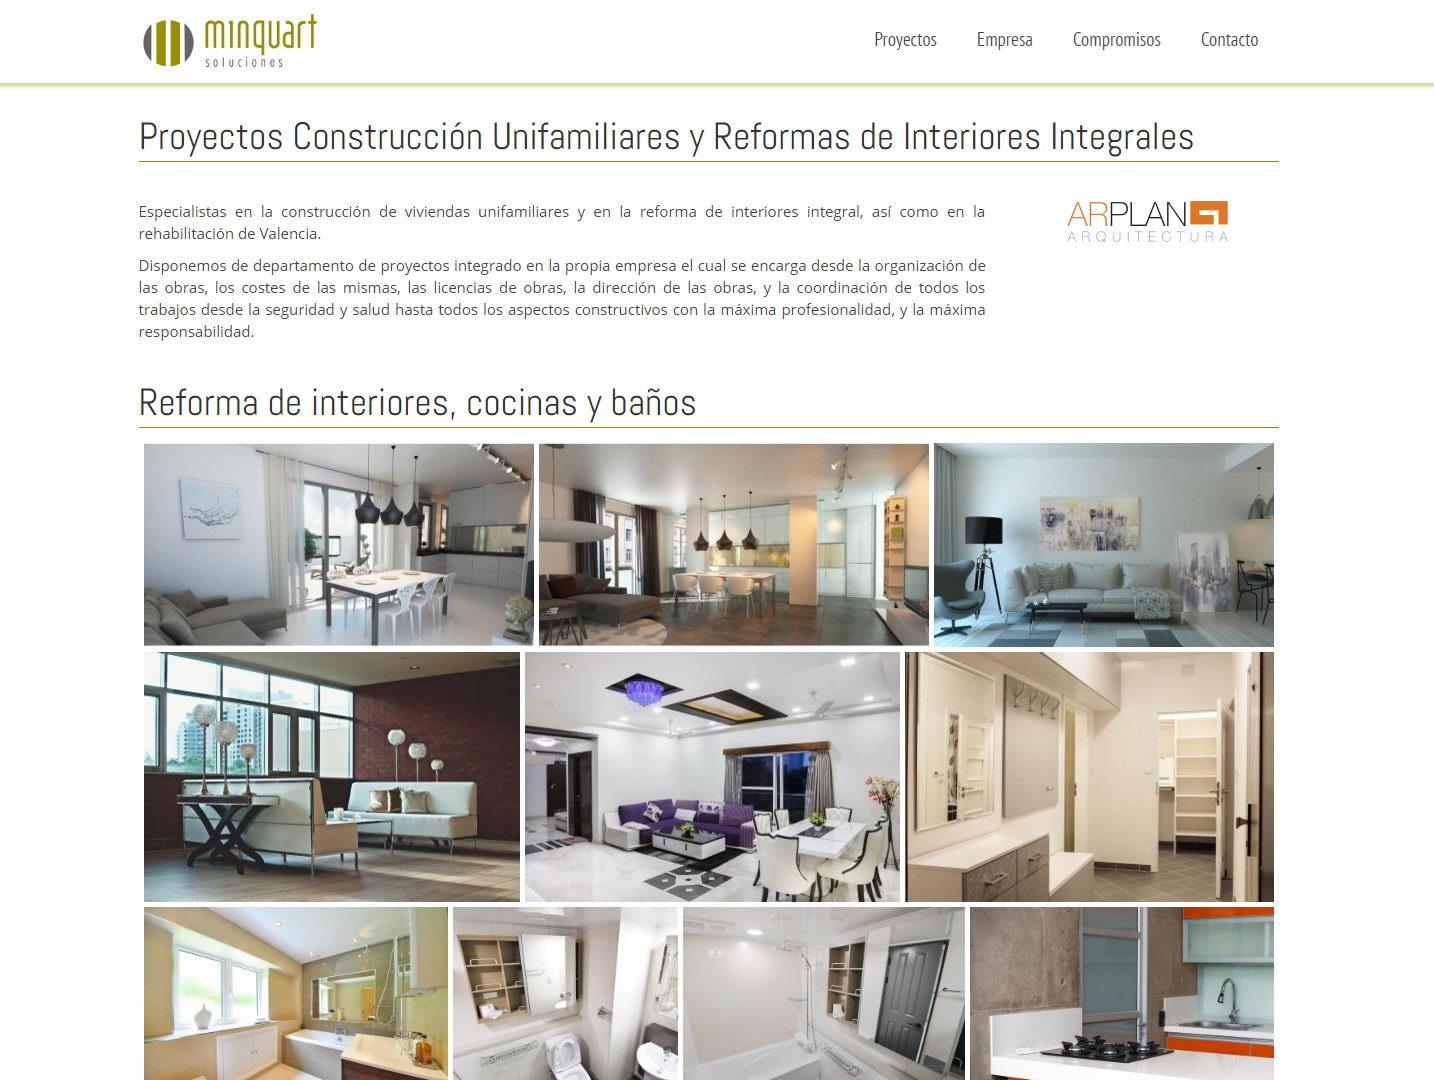 minquart soluciones empresa construccion reformas valencia diseño web wordpress galeria